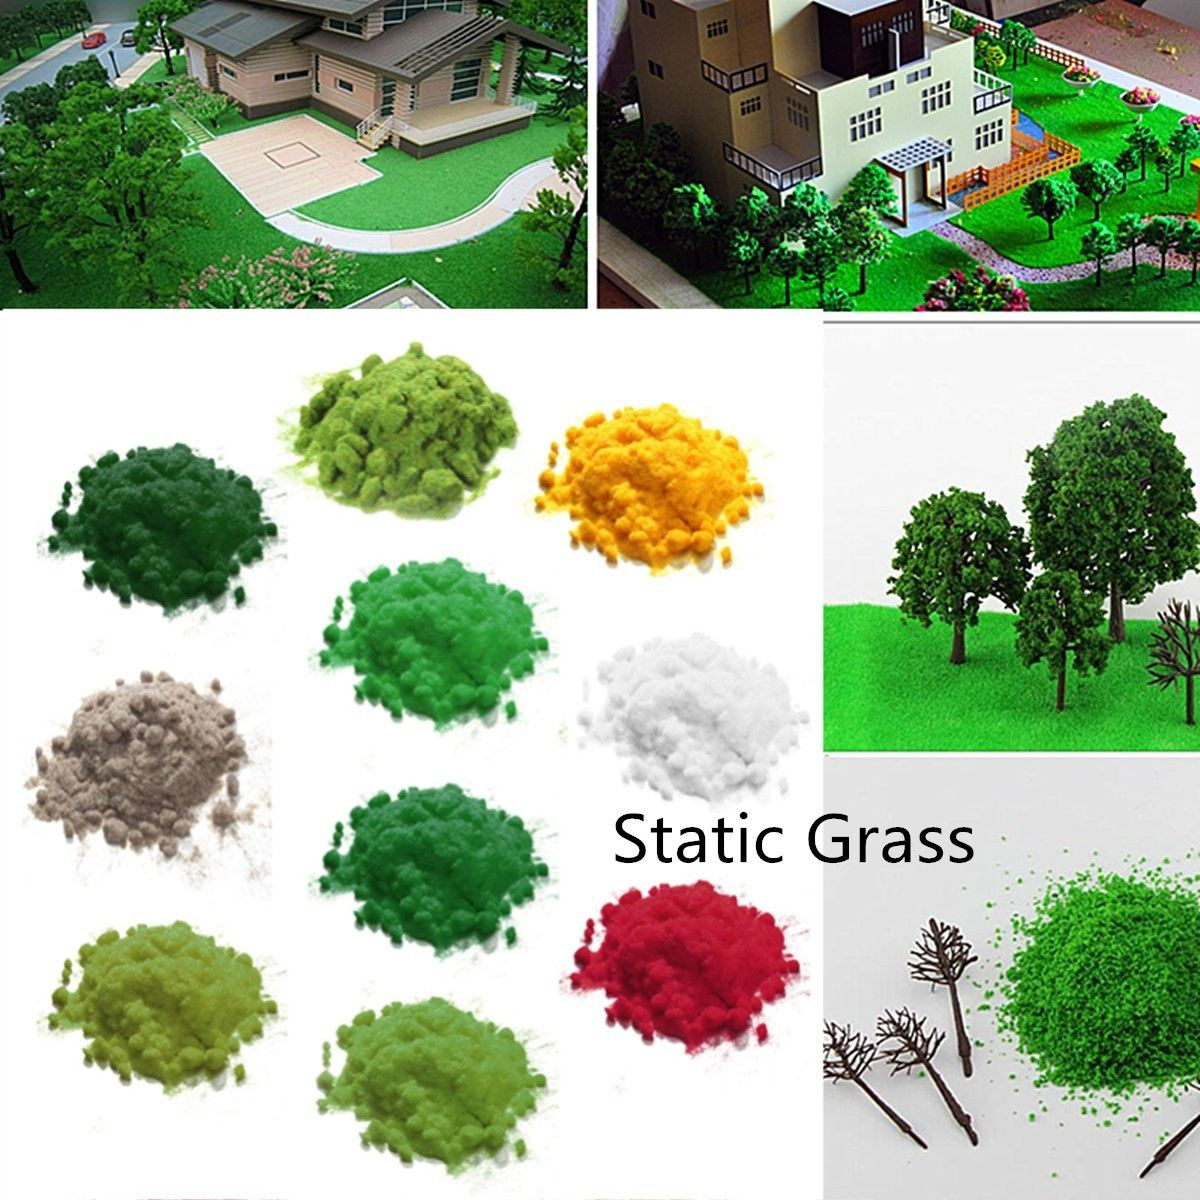 Miniature Scene Model O HO N Scale Model Green Turf Flock LawnGrass Powder STATIC GRASS 30g 2MM Modeling Hobby Craft Accessory